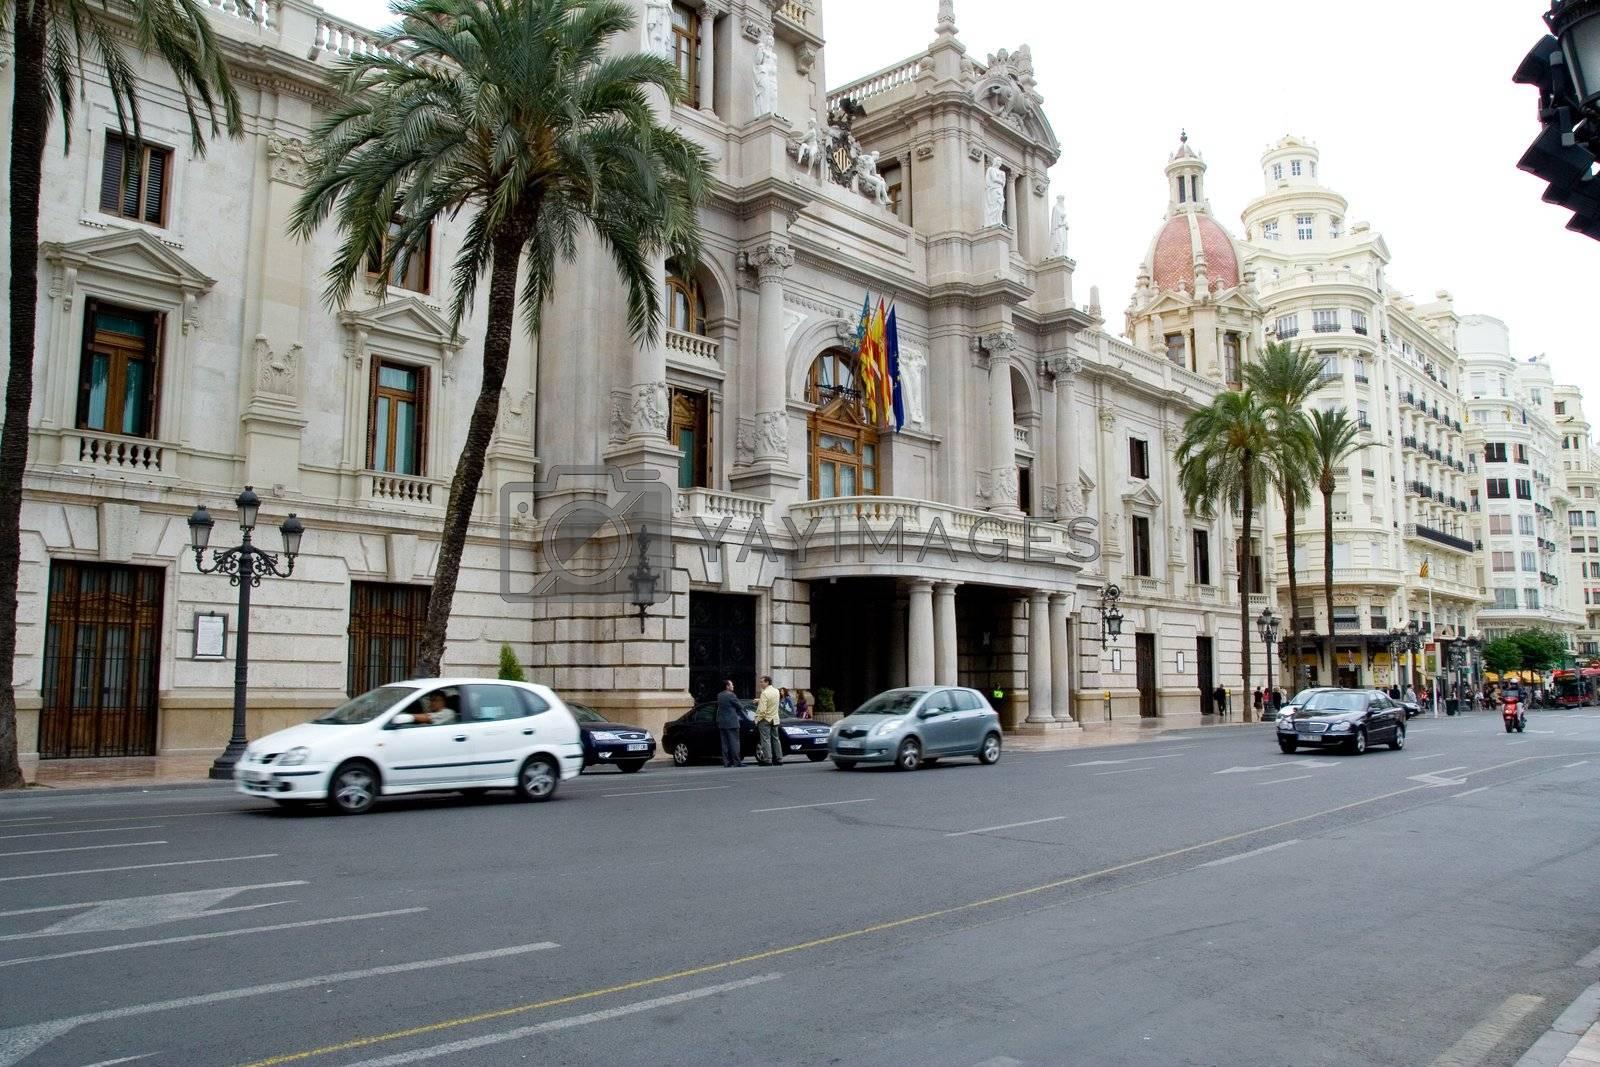 City Hall Building in Valencia, Spain